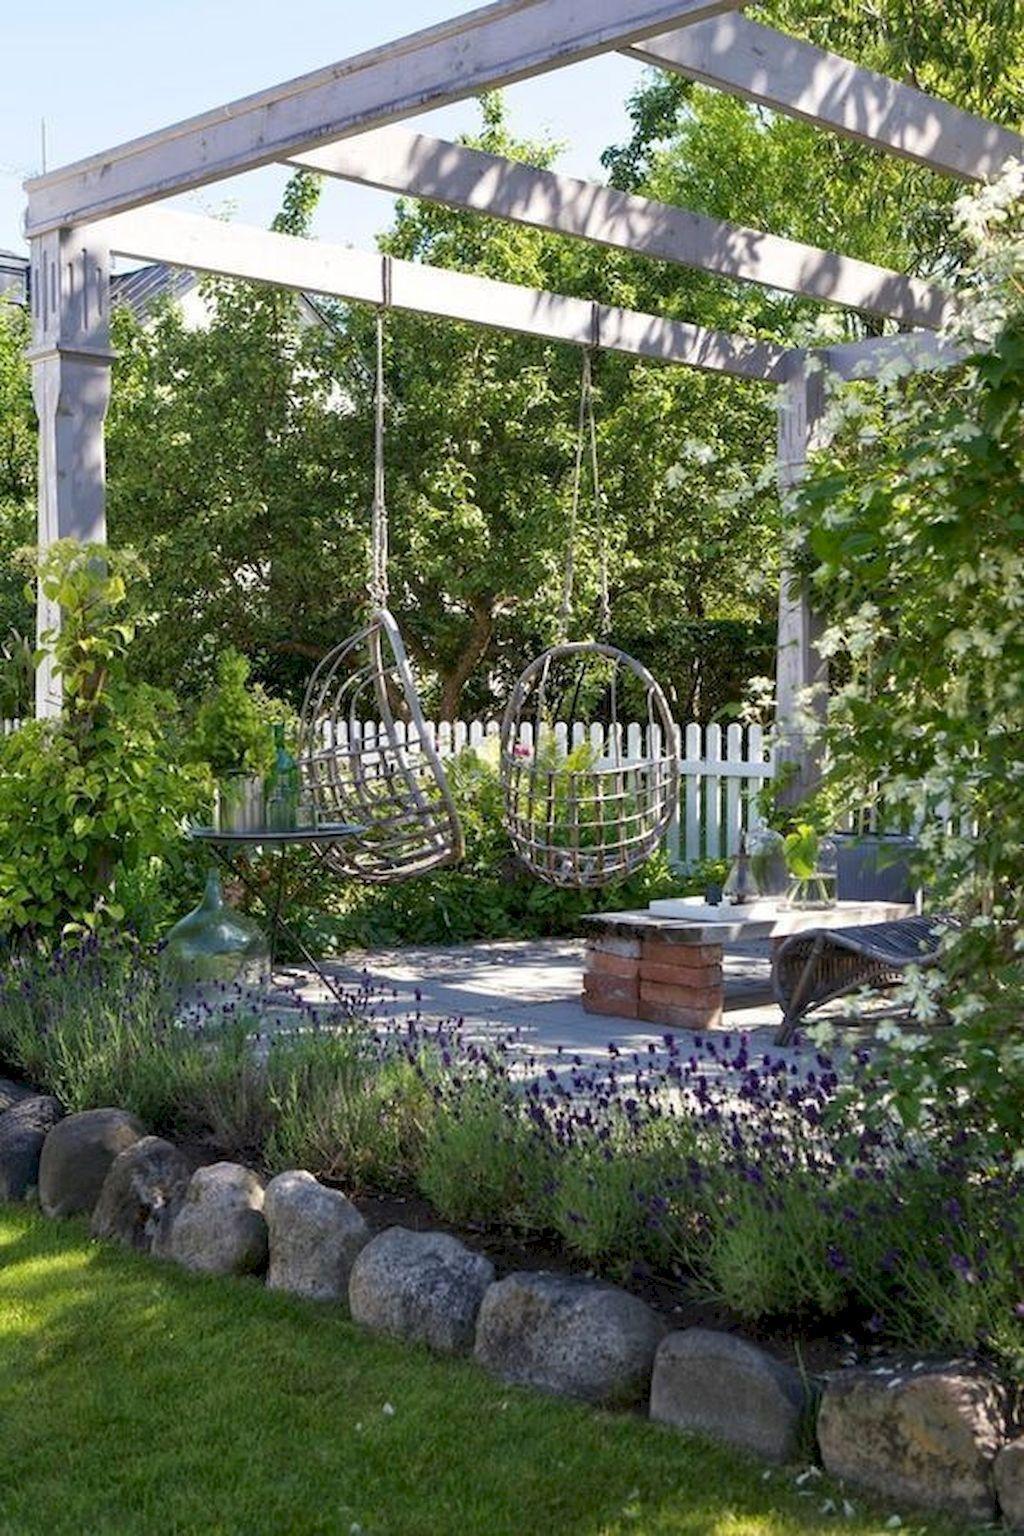 70 gorgeous small backyard landscaping ideas backyard on gorgeous small backyard landscaping ideas id=77989